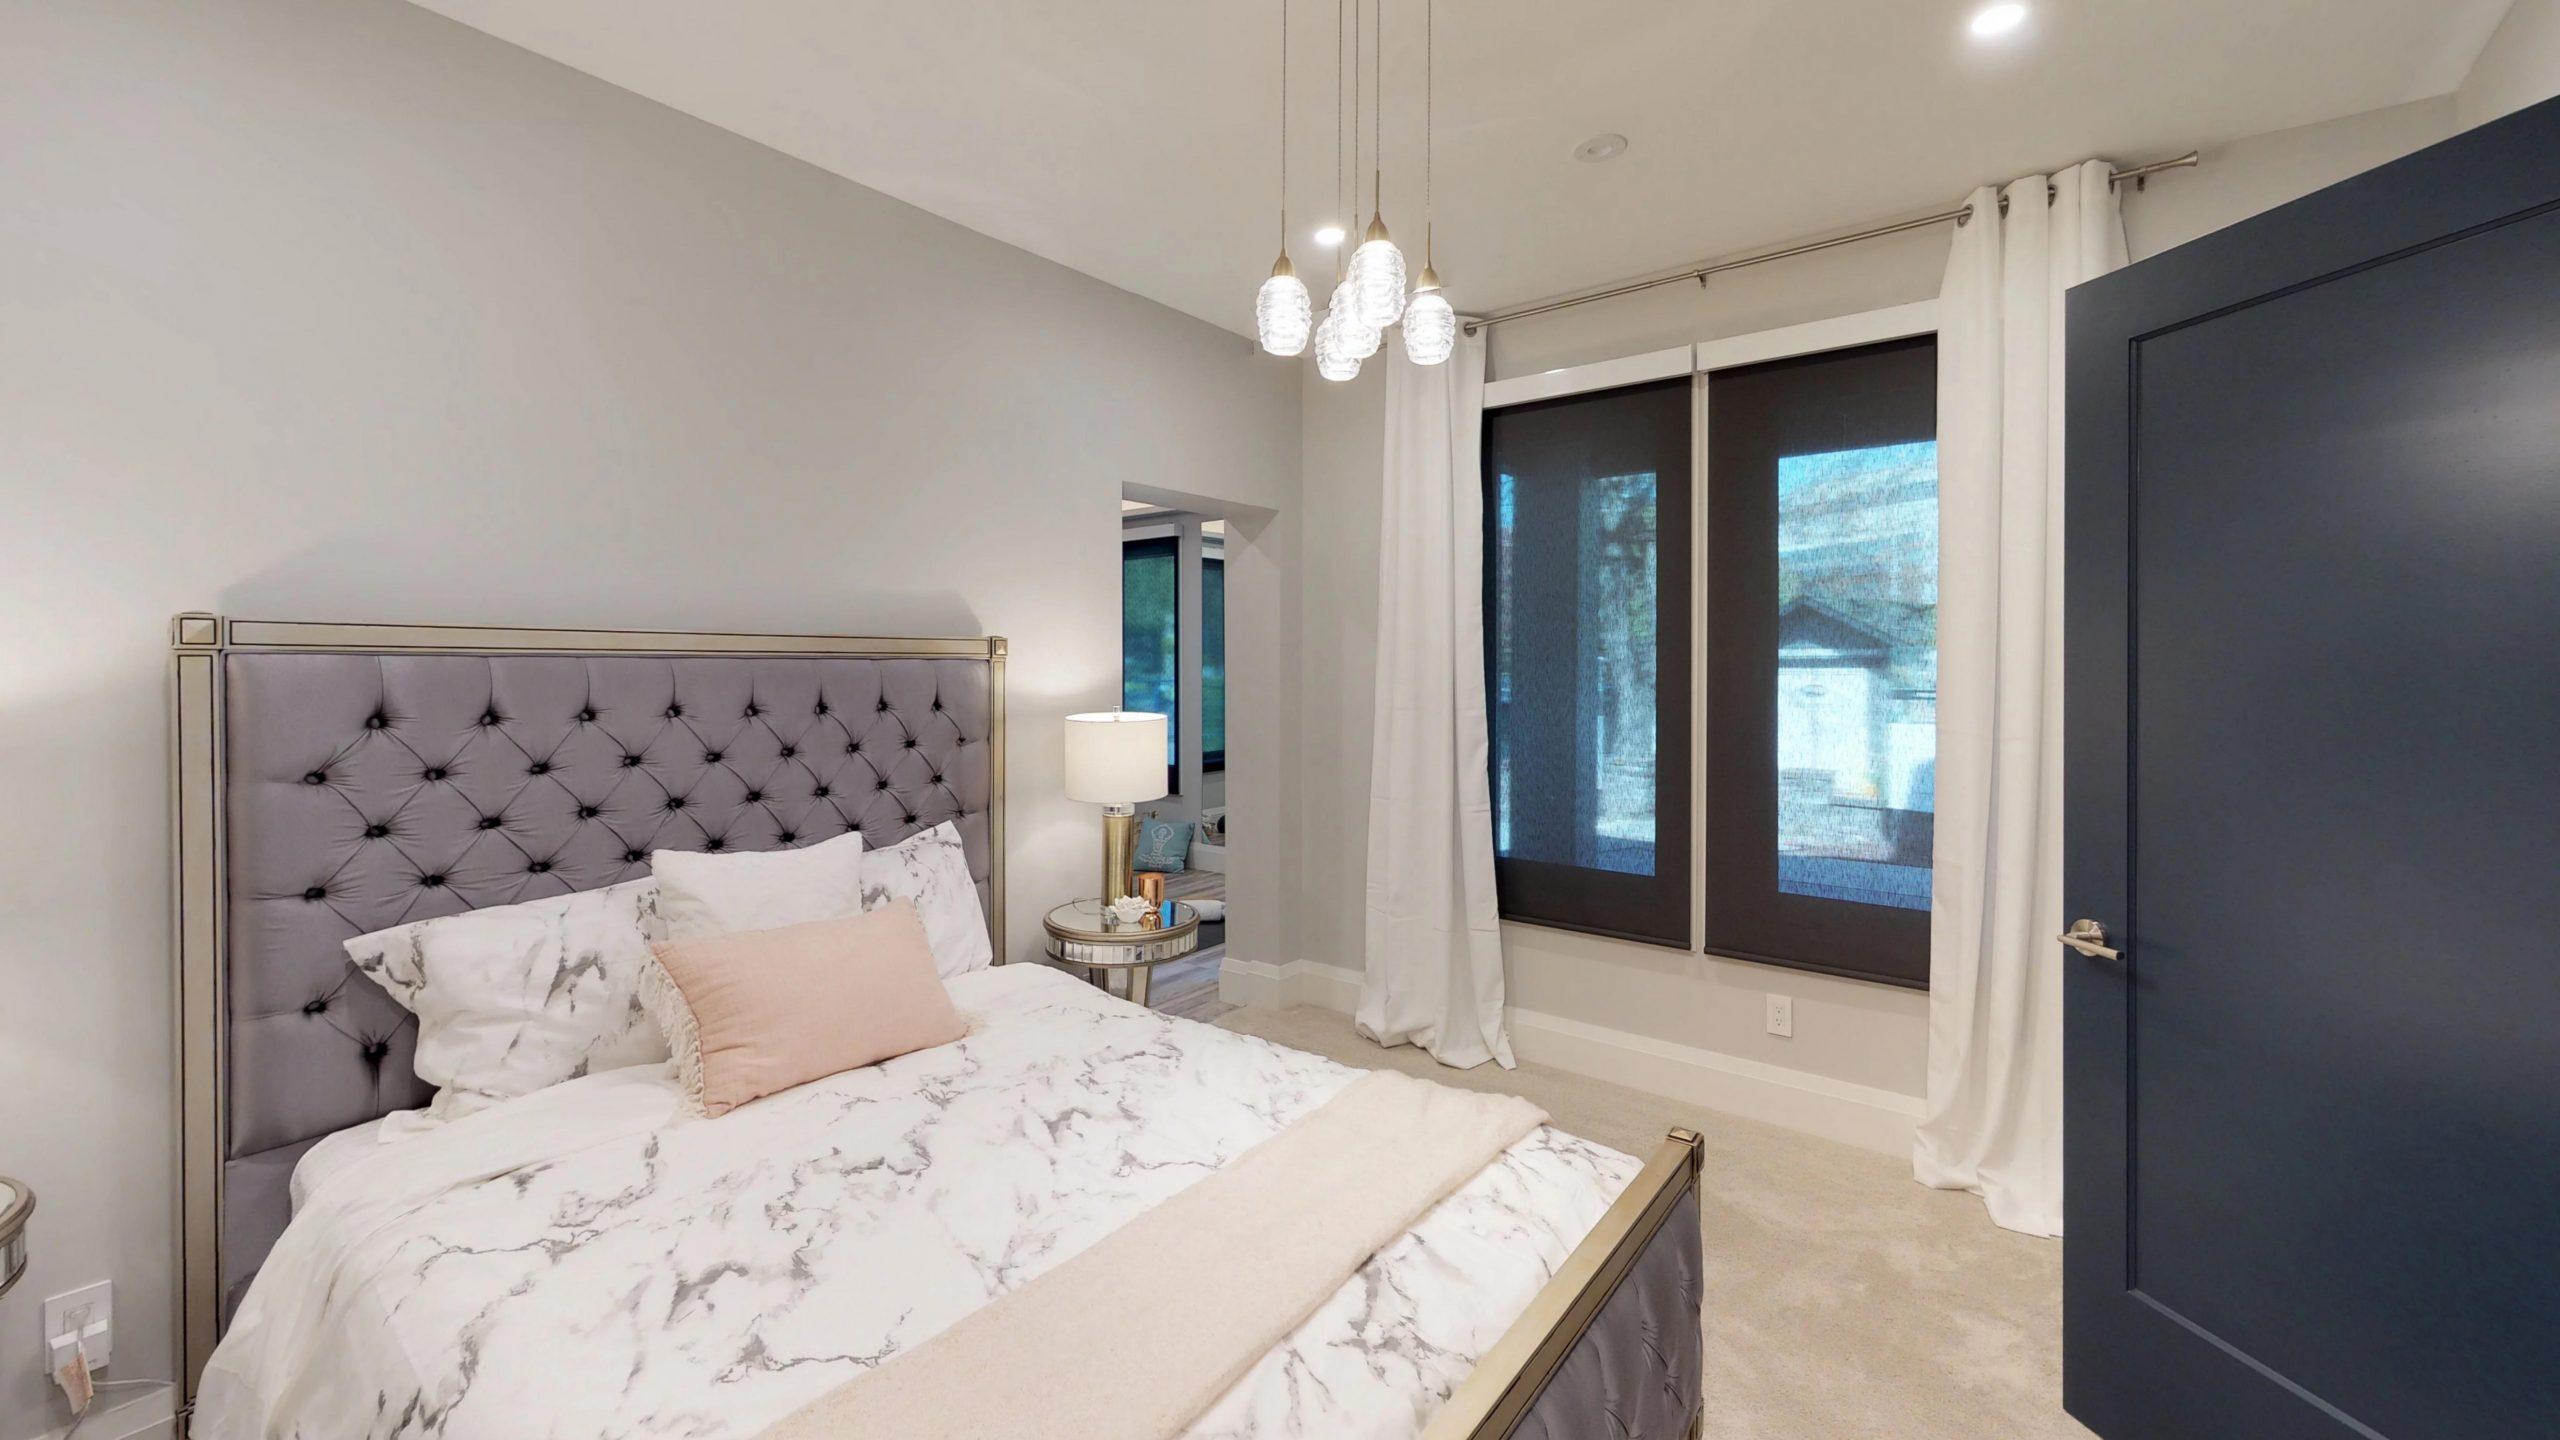 Guest Bedrooms, Laundry Room & Elevator  PNE Blog - Laundry Room Guest Bedroom